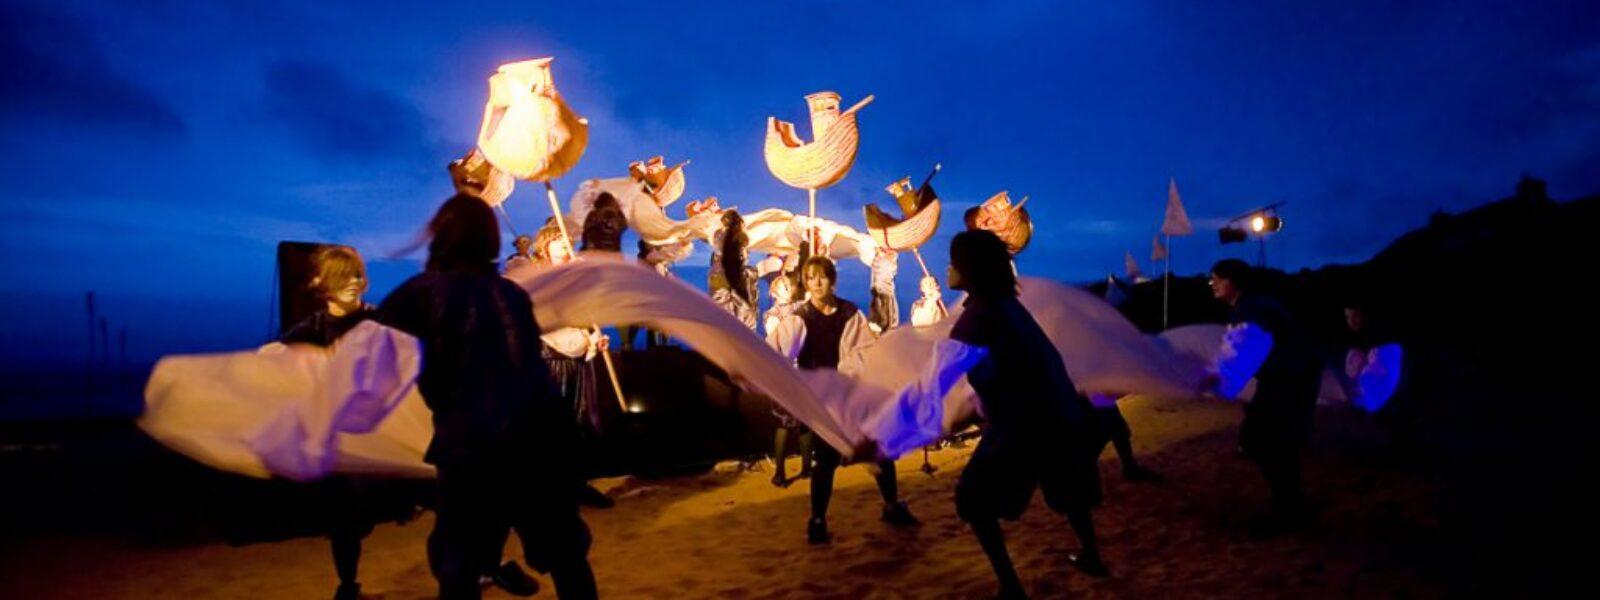 2.-Festival-History-1024x682